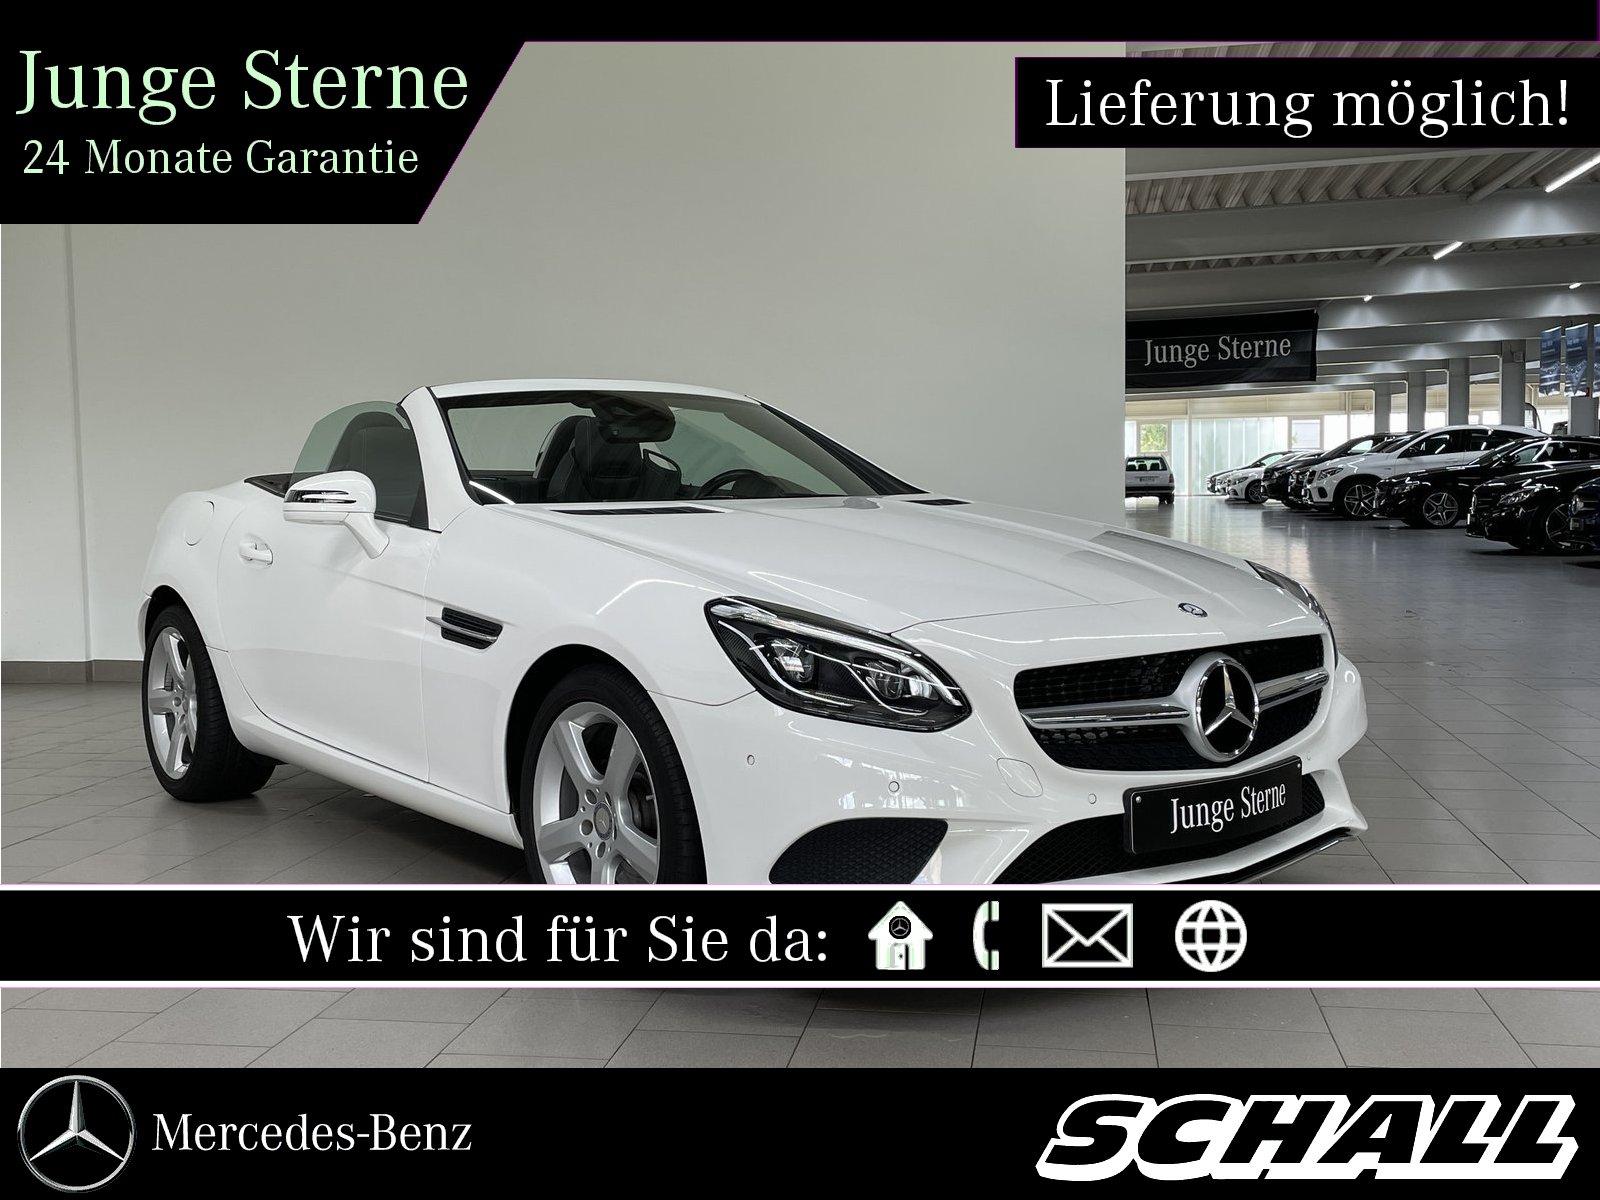 Mercedes-Benz SLC 200 AIRSCARF+LEDER+LED ILS+COMAND+TOTWINKEL, Jahr 2016, Benzin